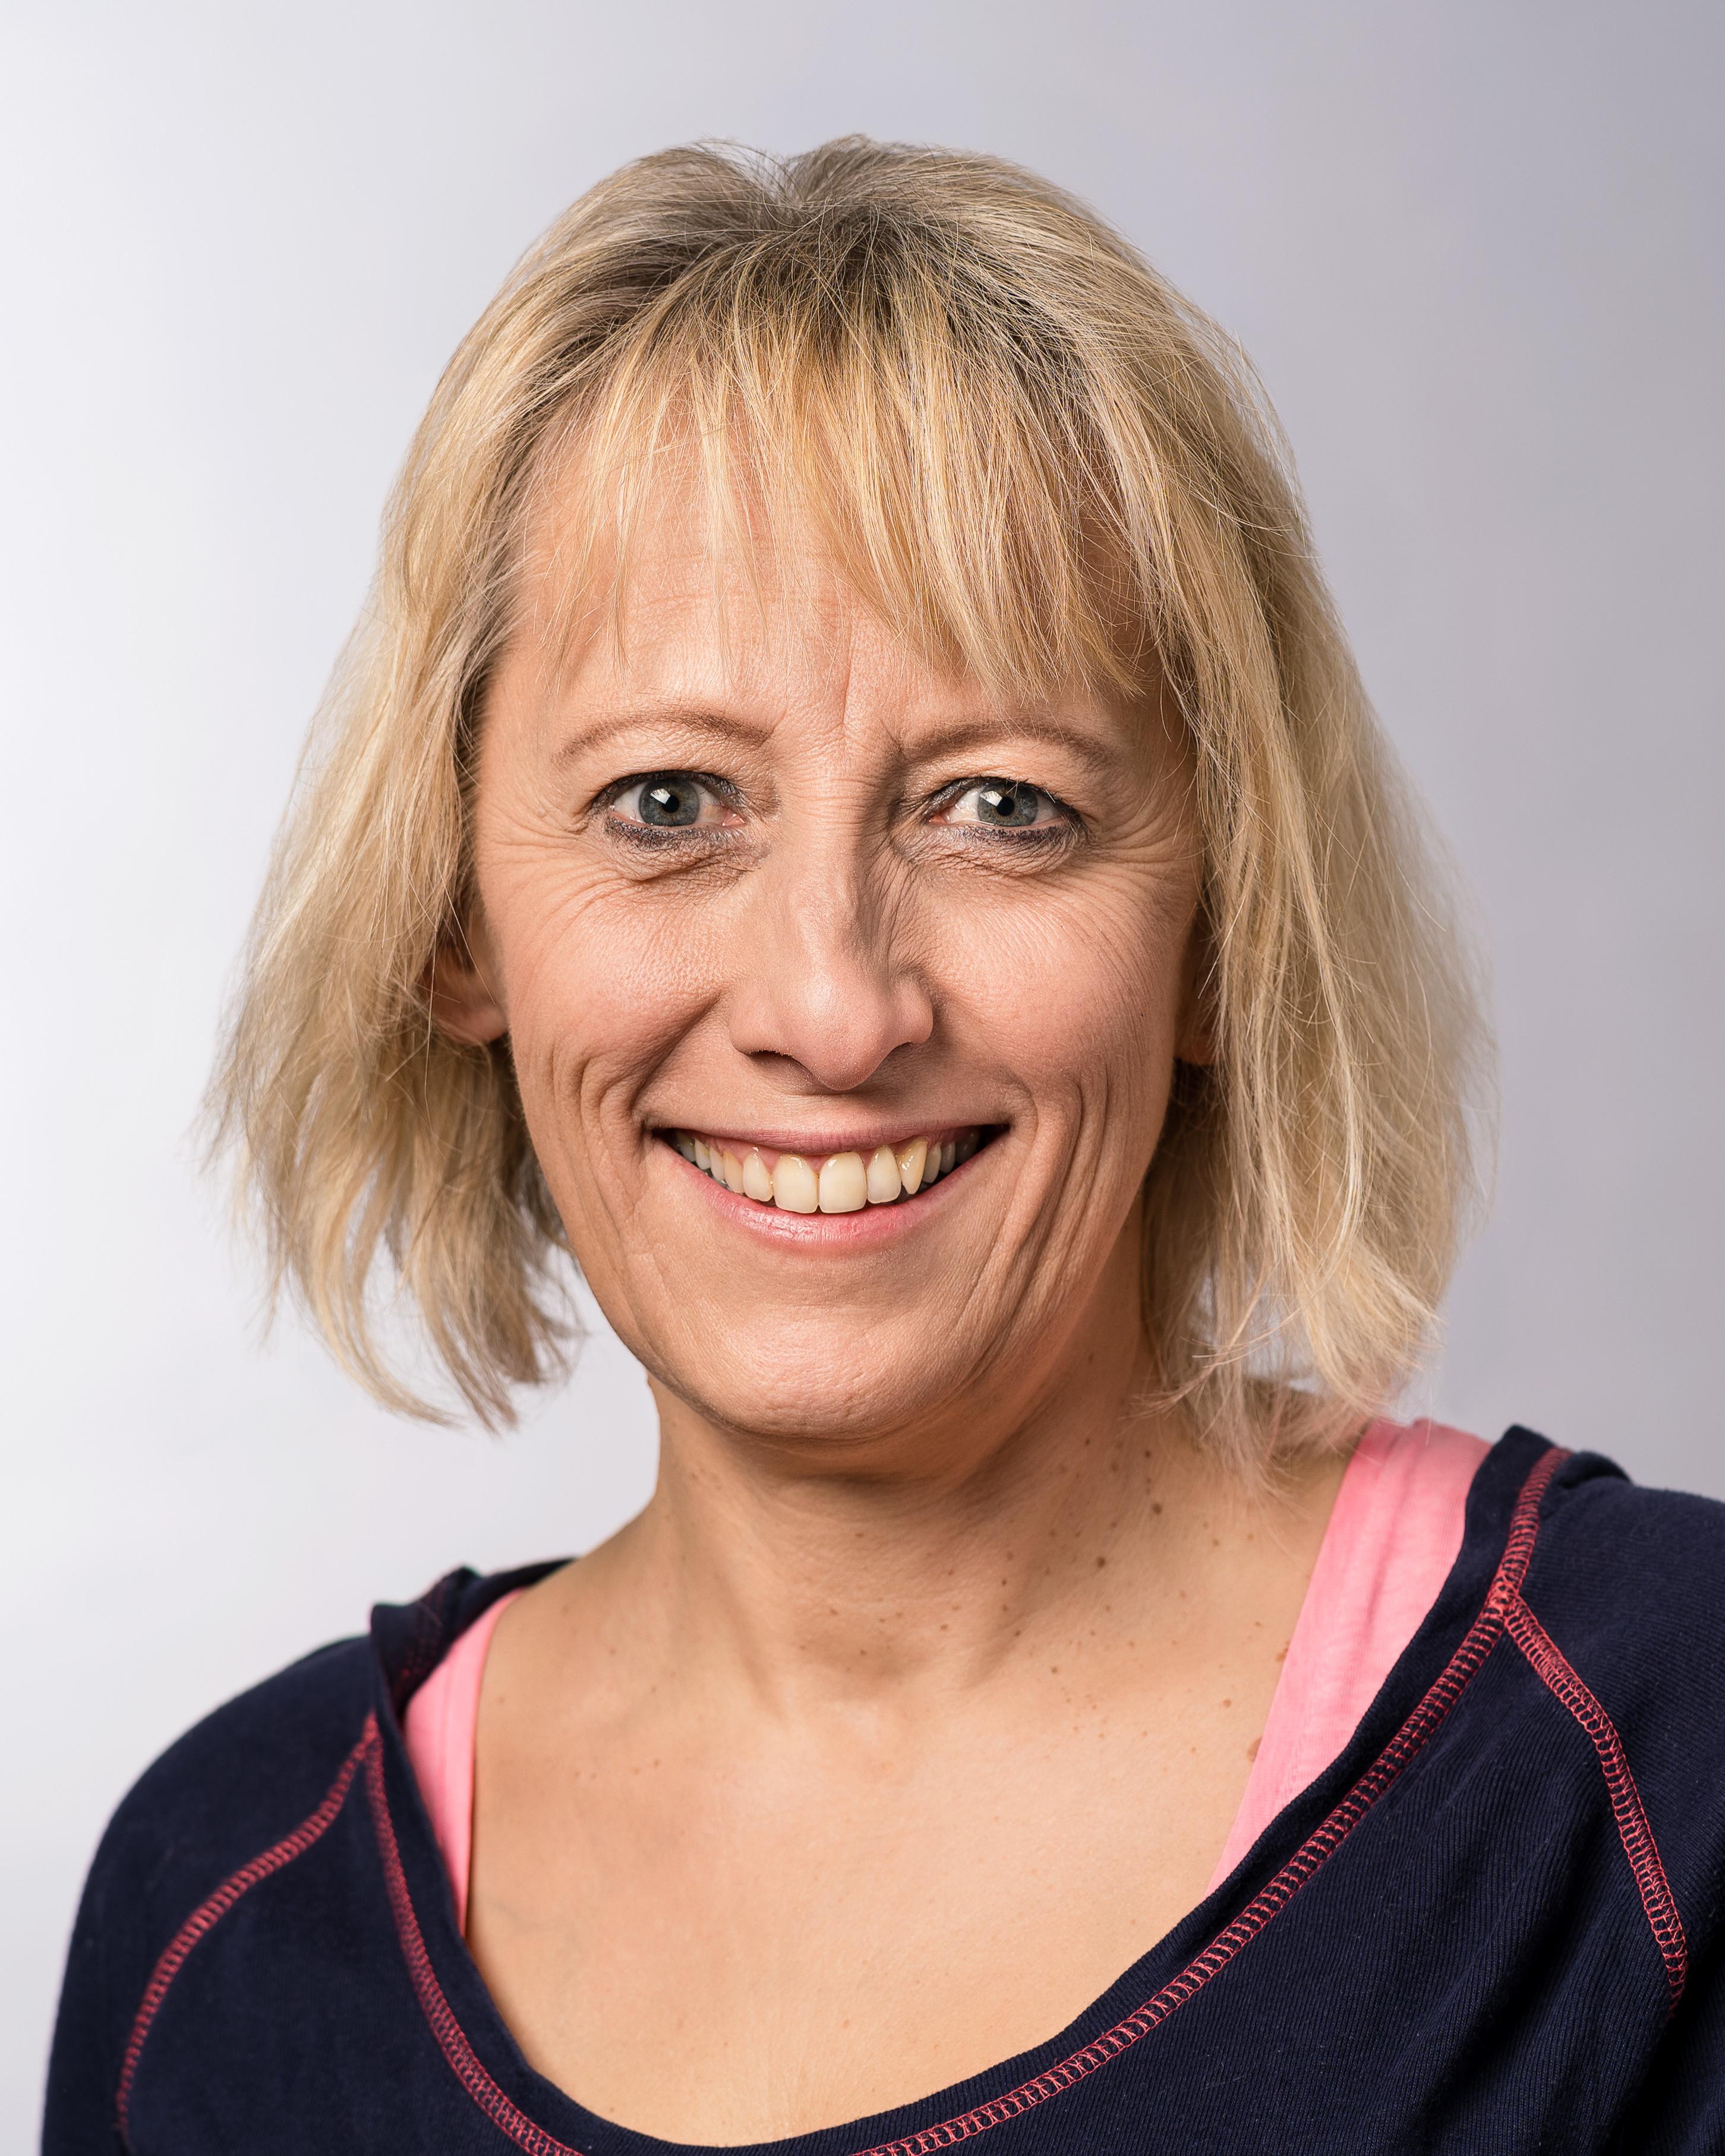 Therese Schürch